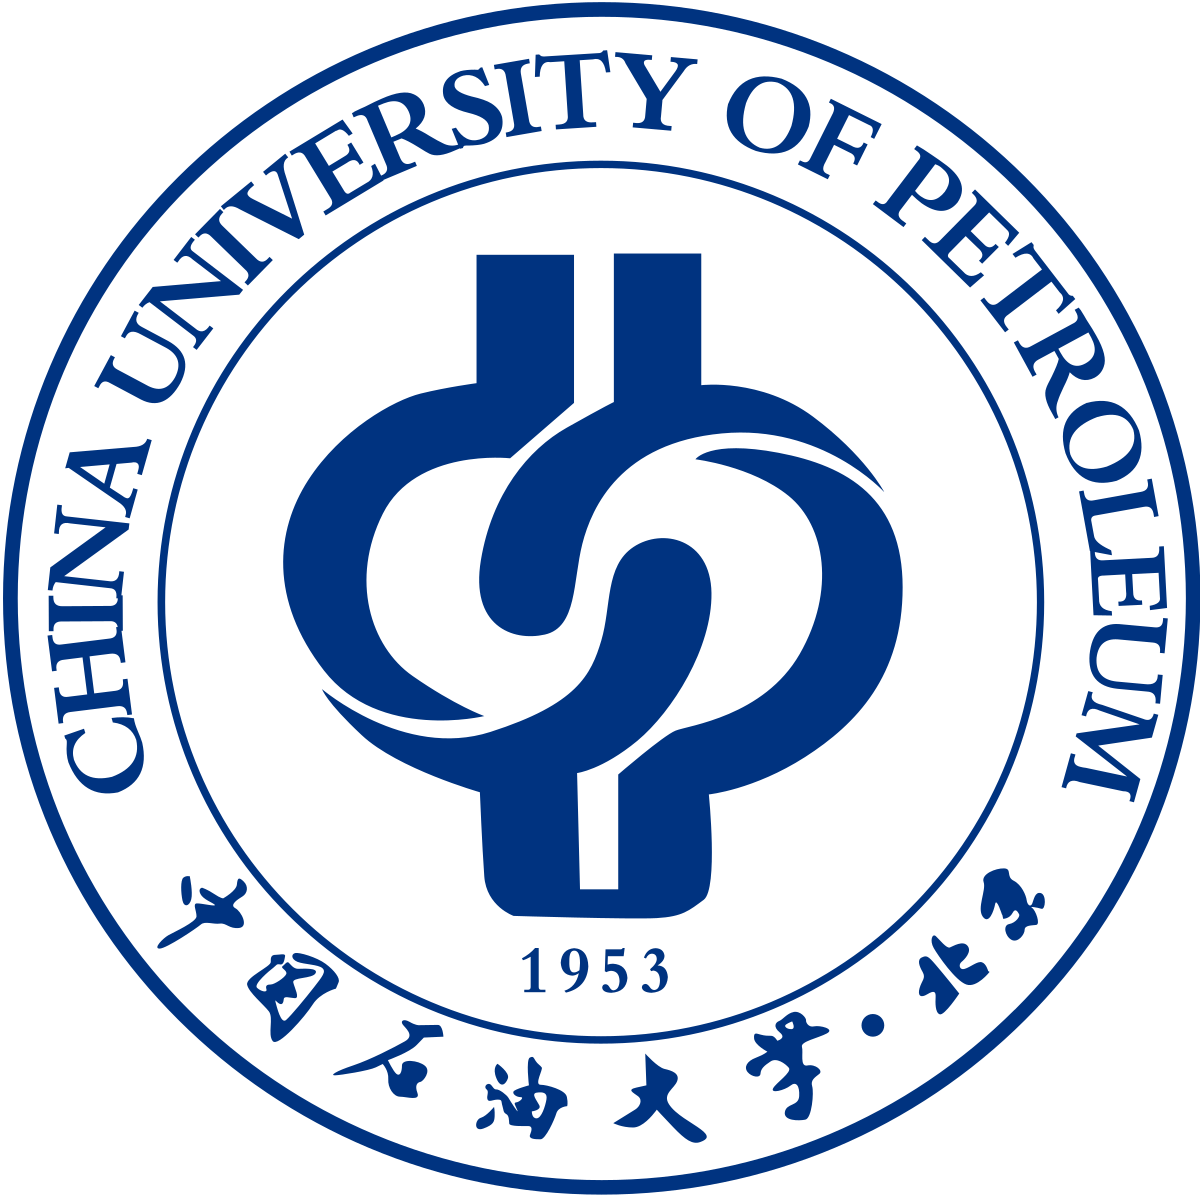 China University of Petroleum